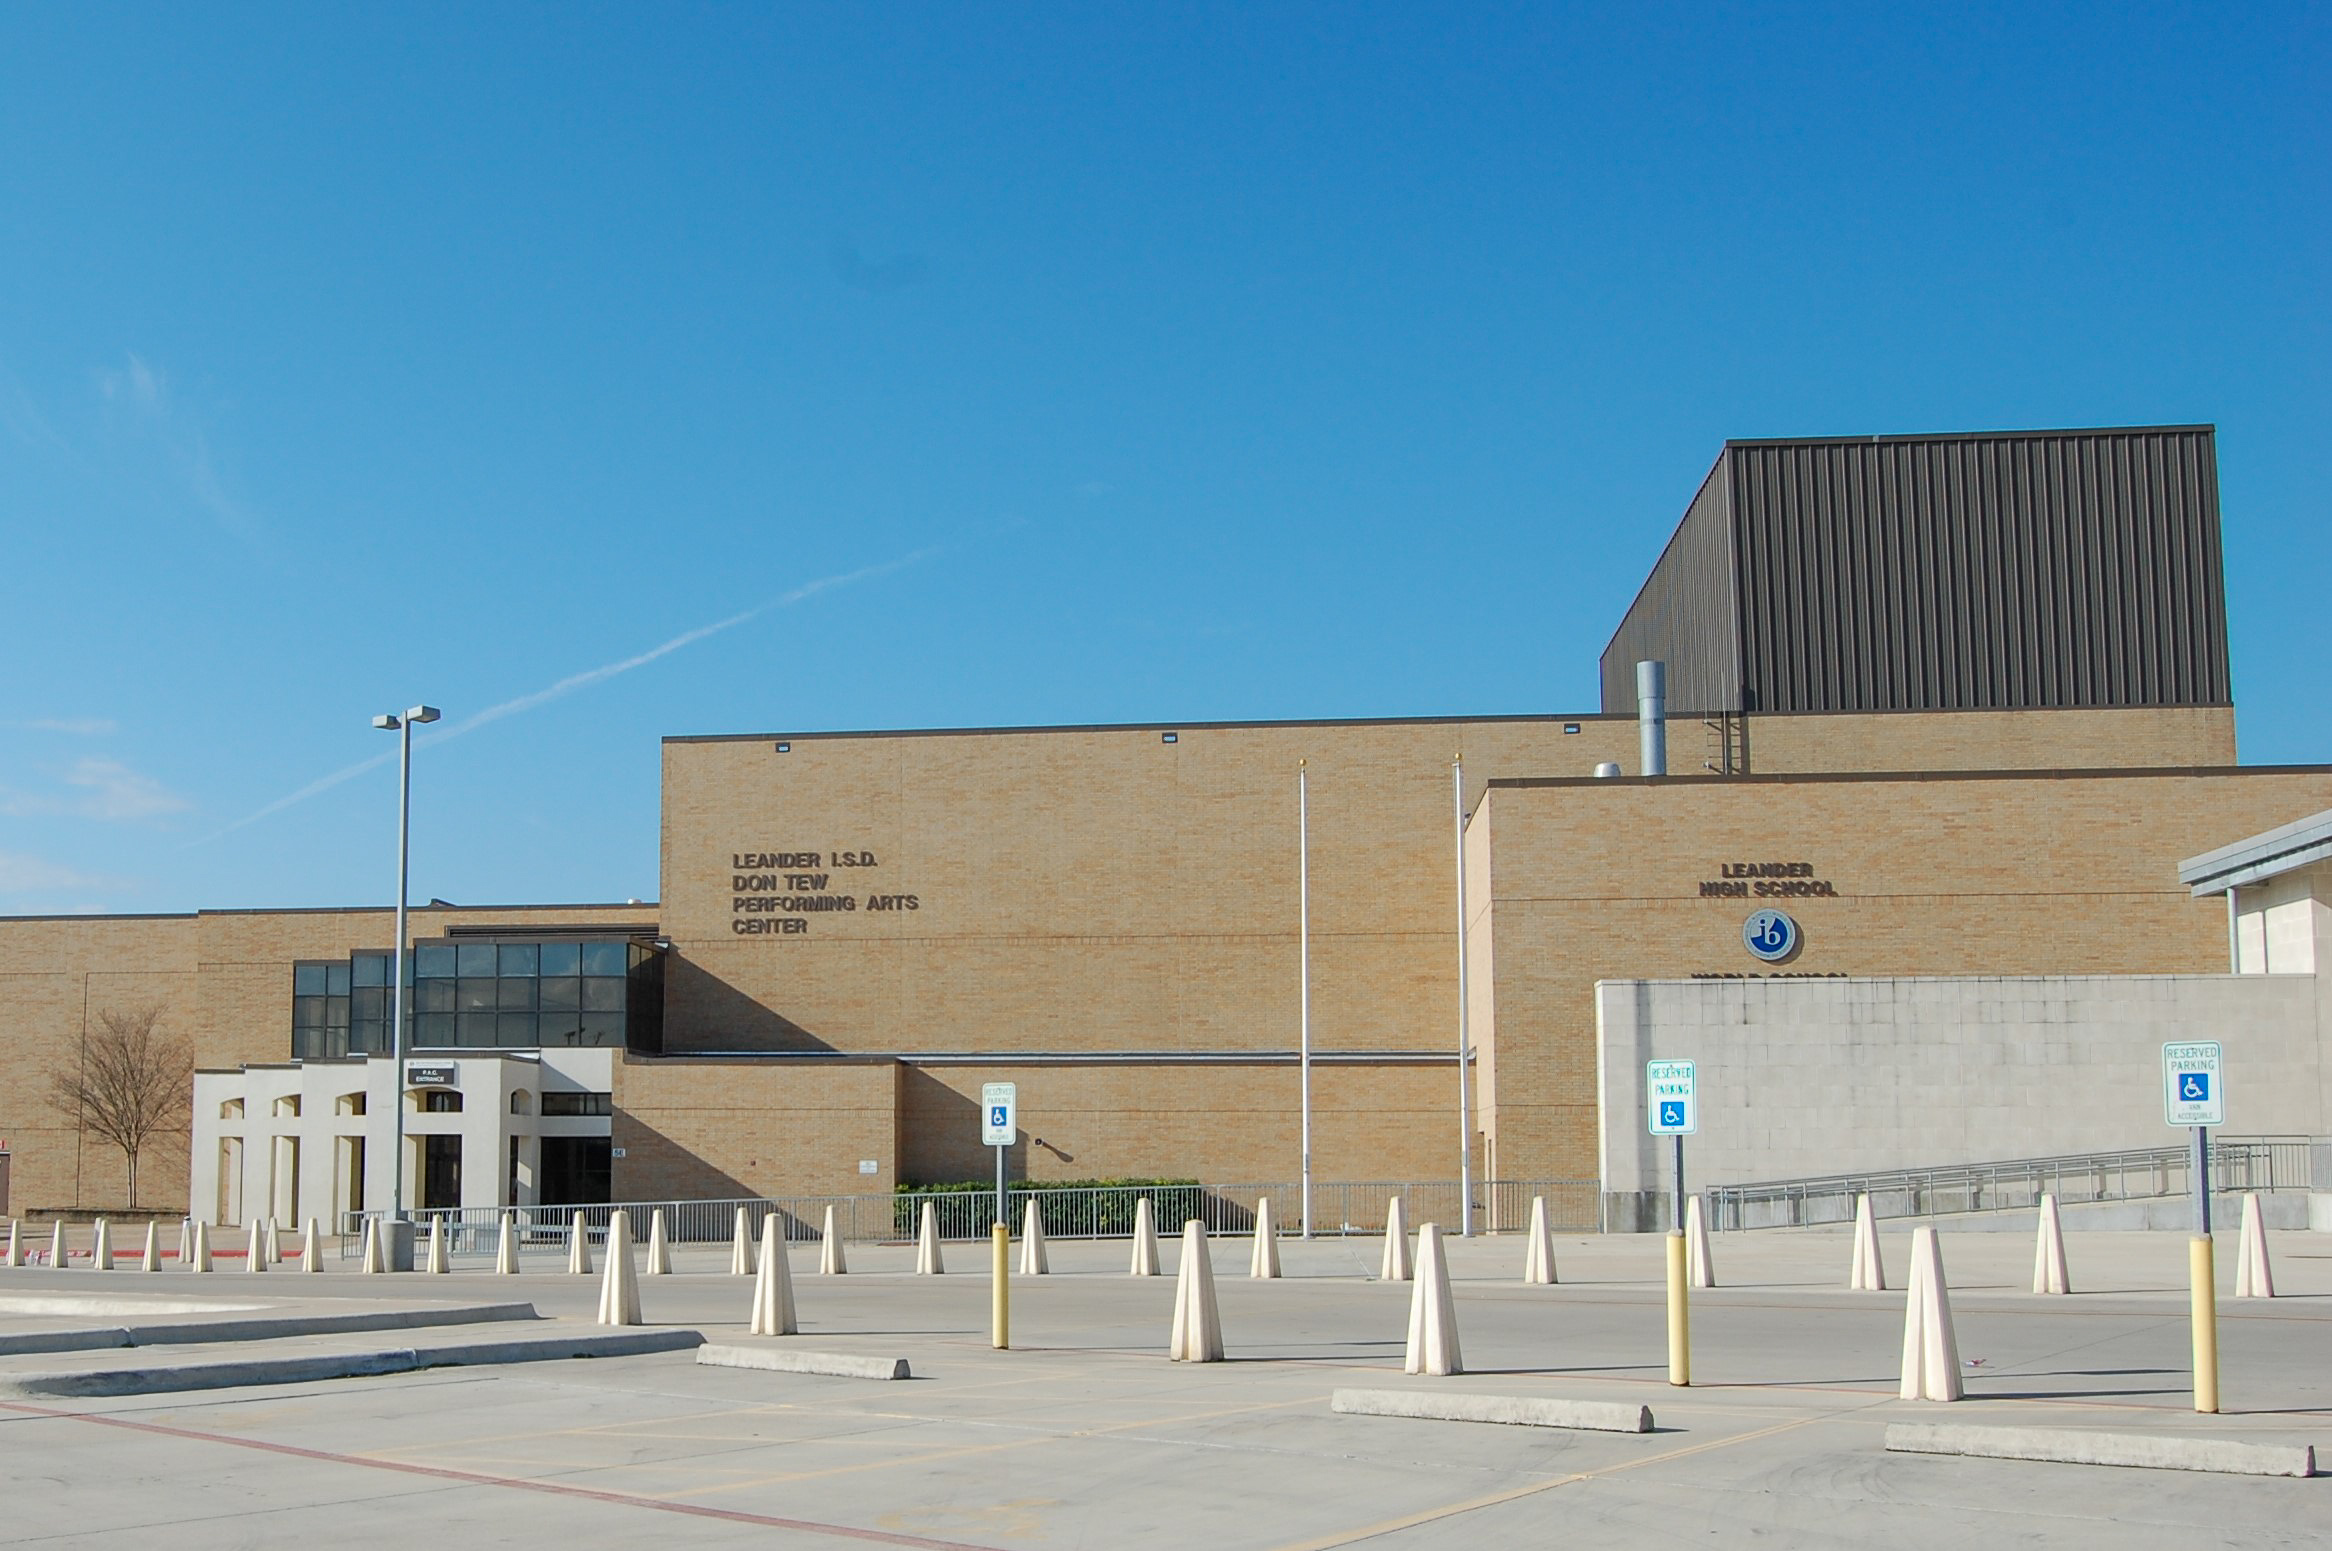 Leander ISD Leander High School Performing Arts Center